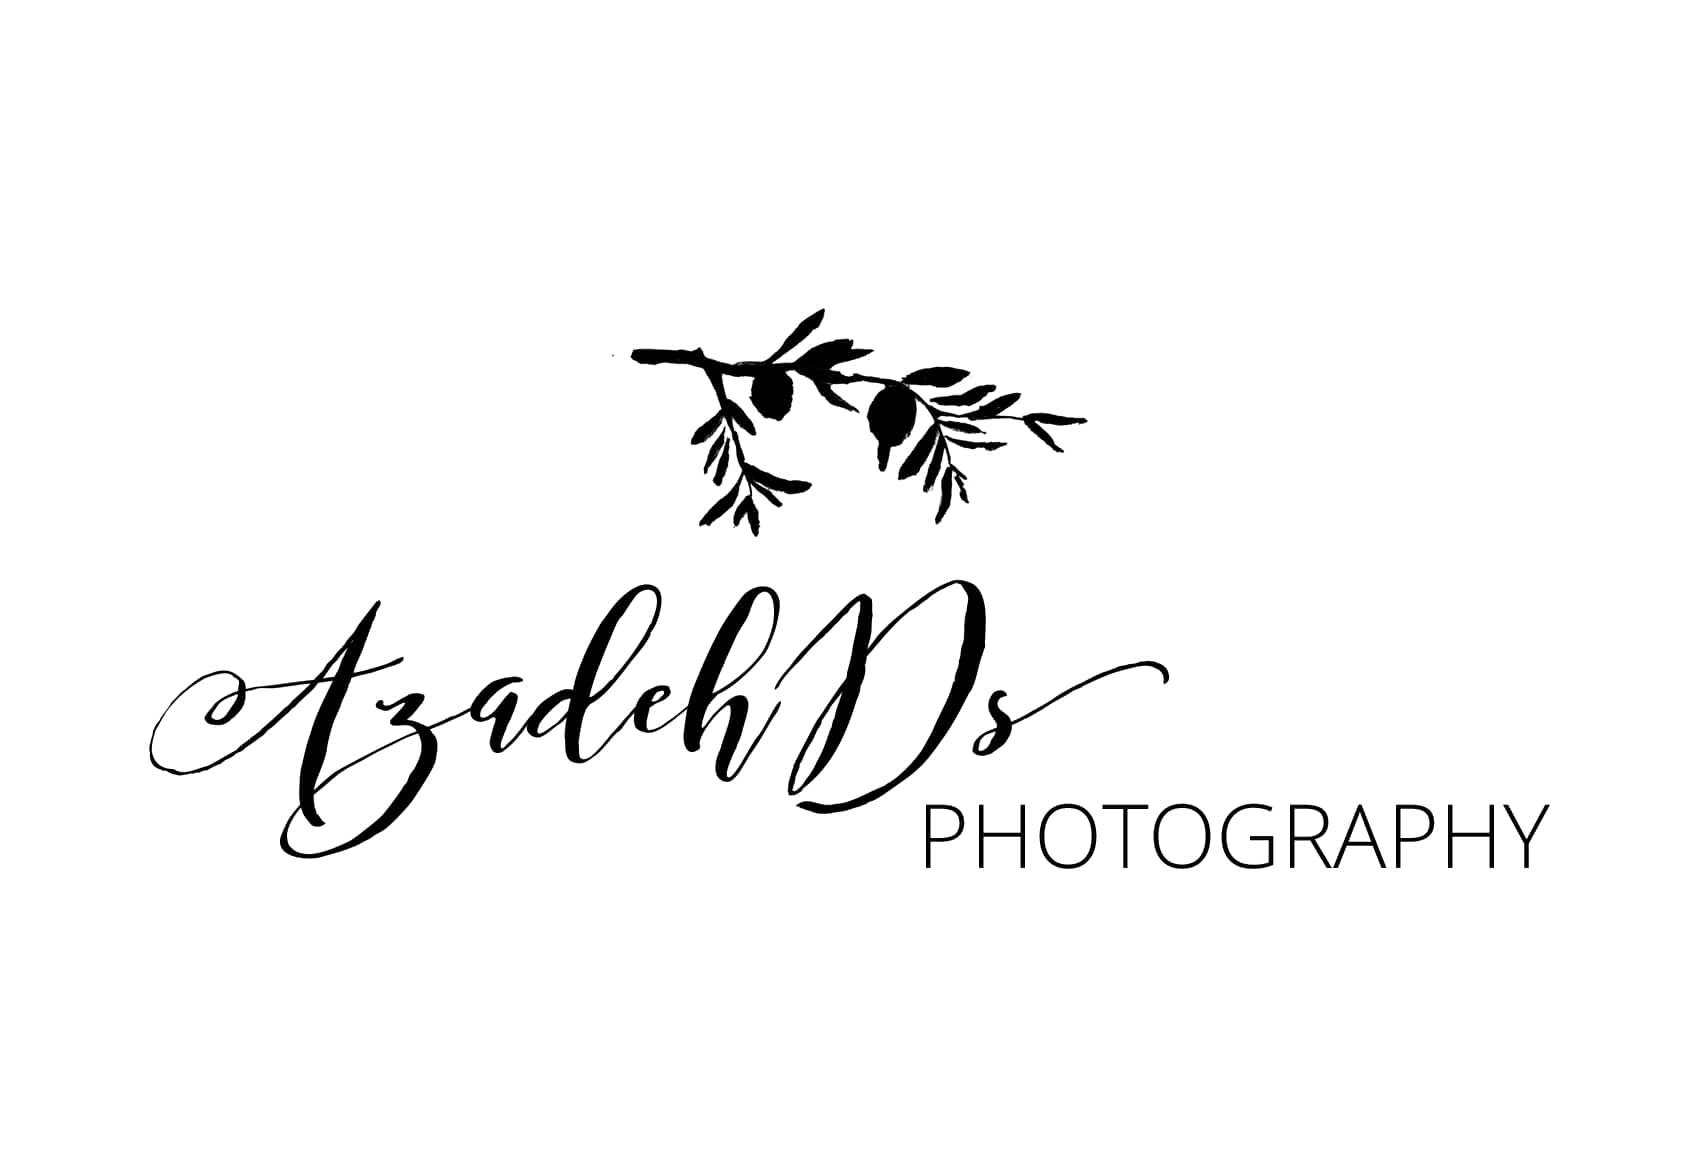 AZADEHDS photography Signature